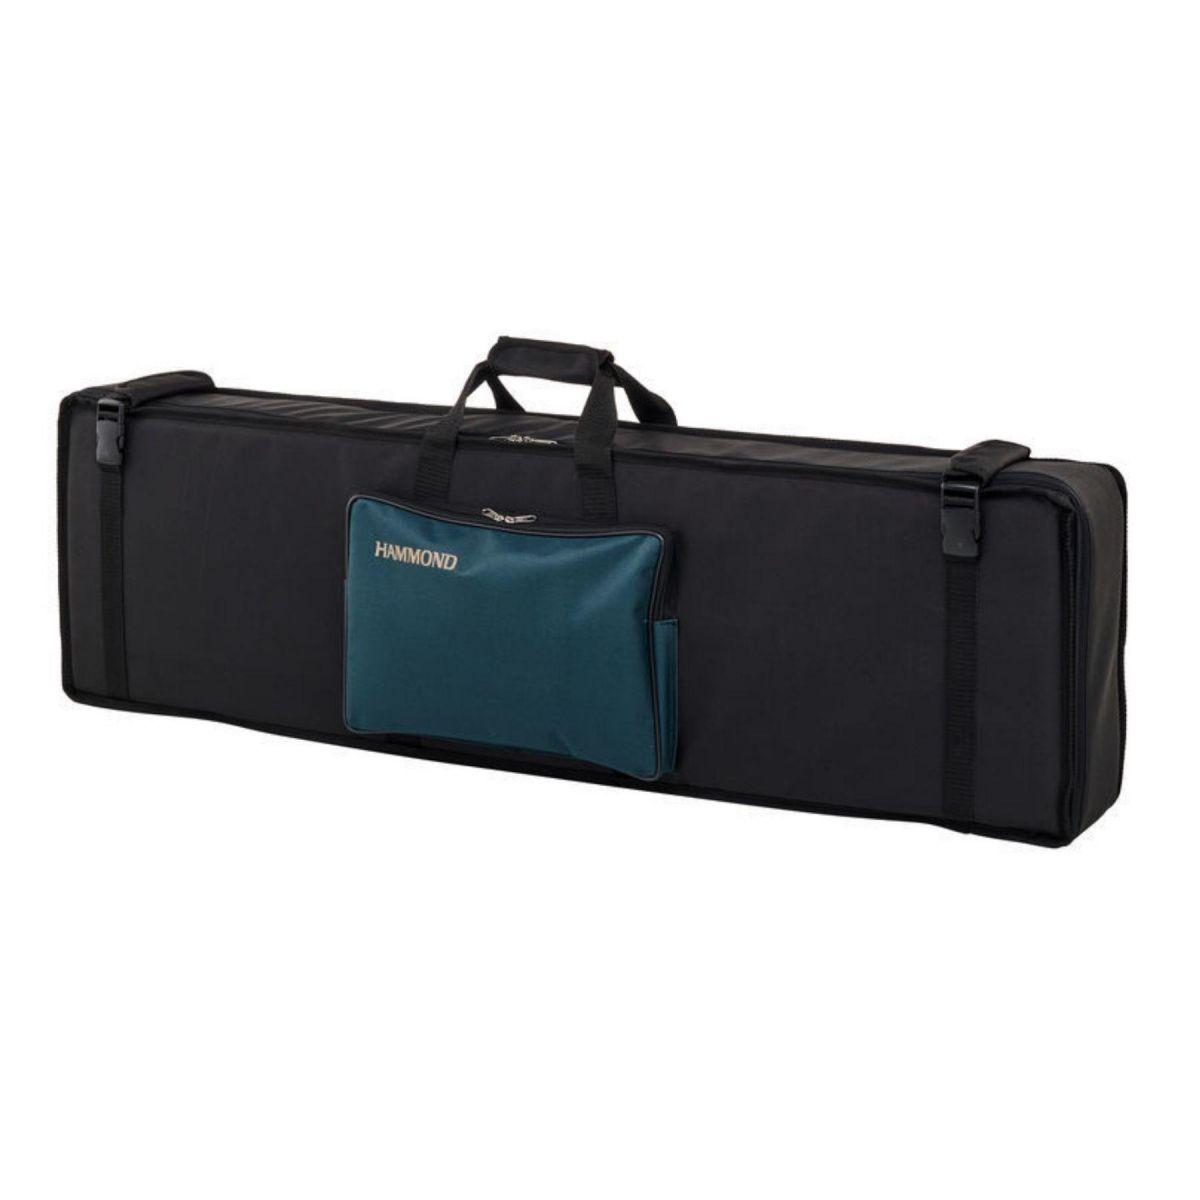 Borsa Organo SK PRO-73 Hammond 117x33x12cm